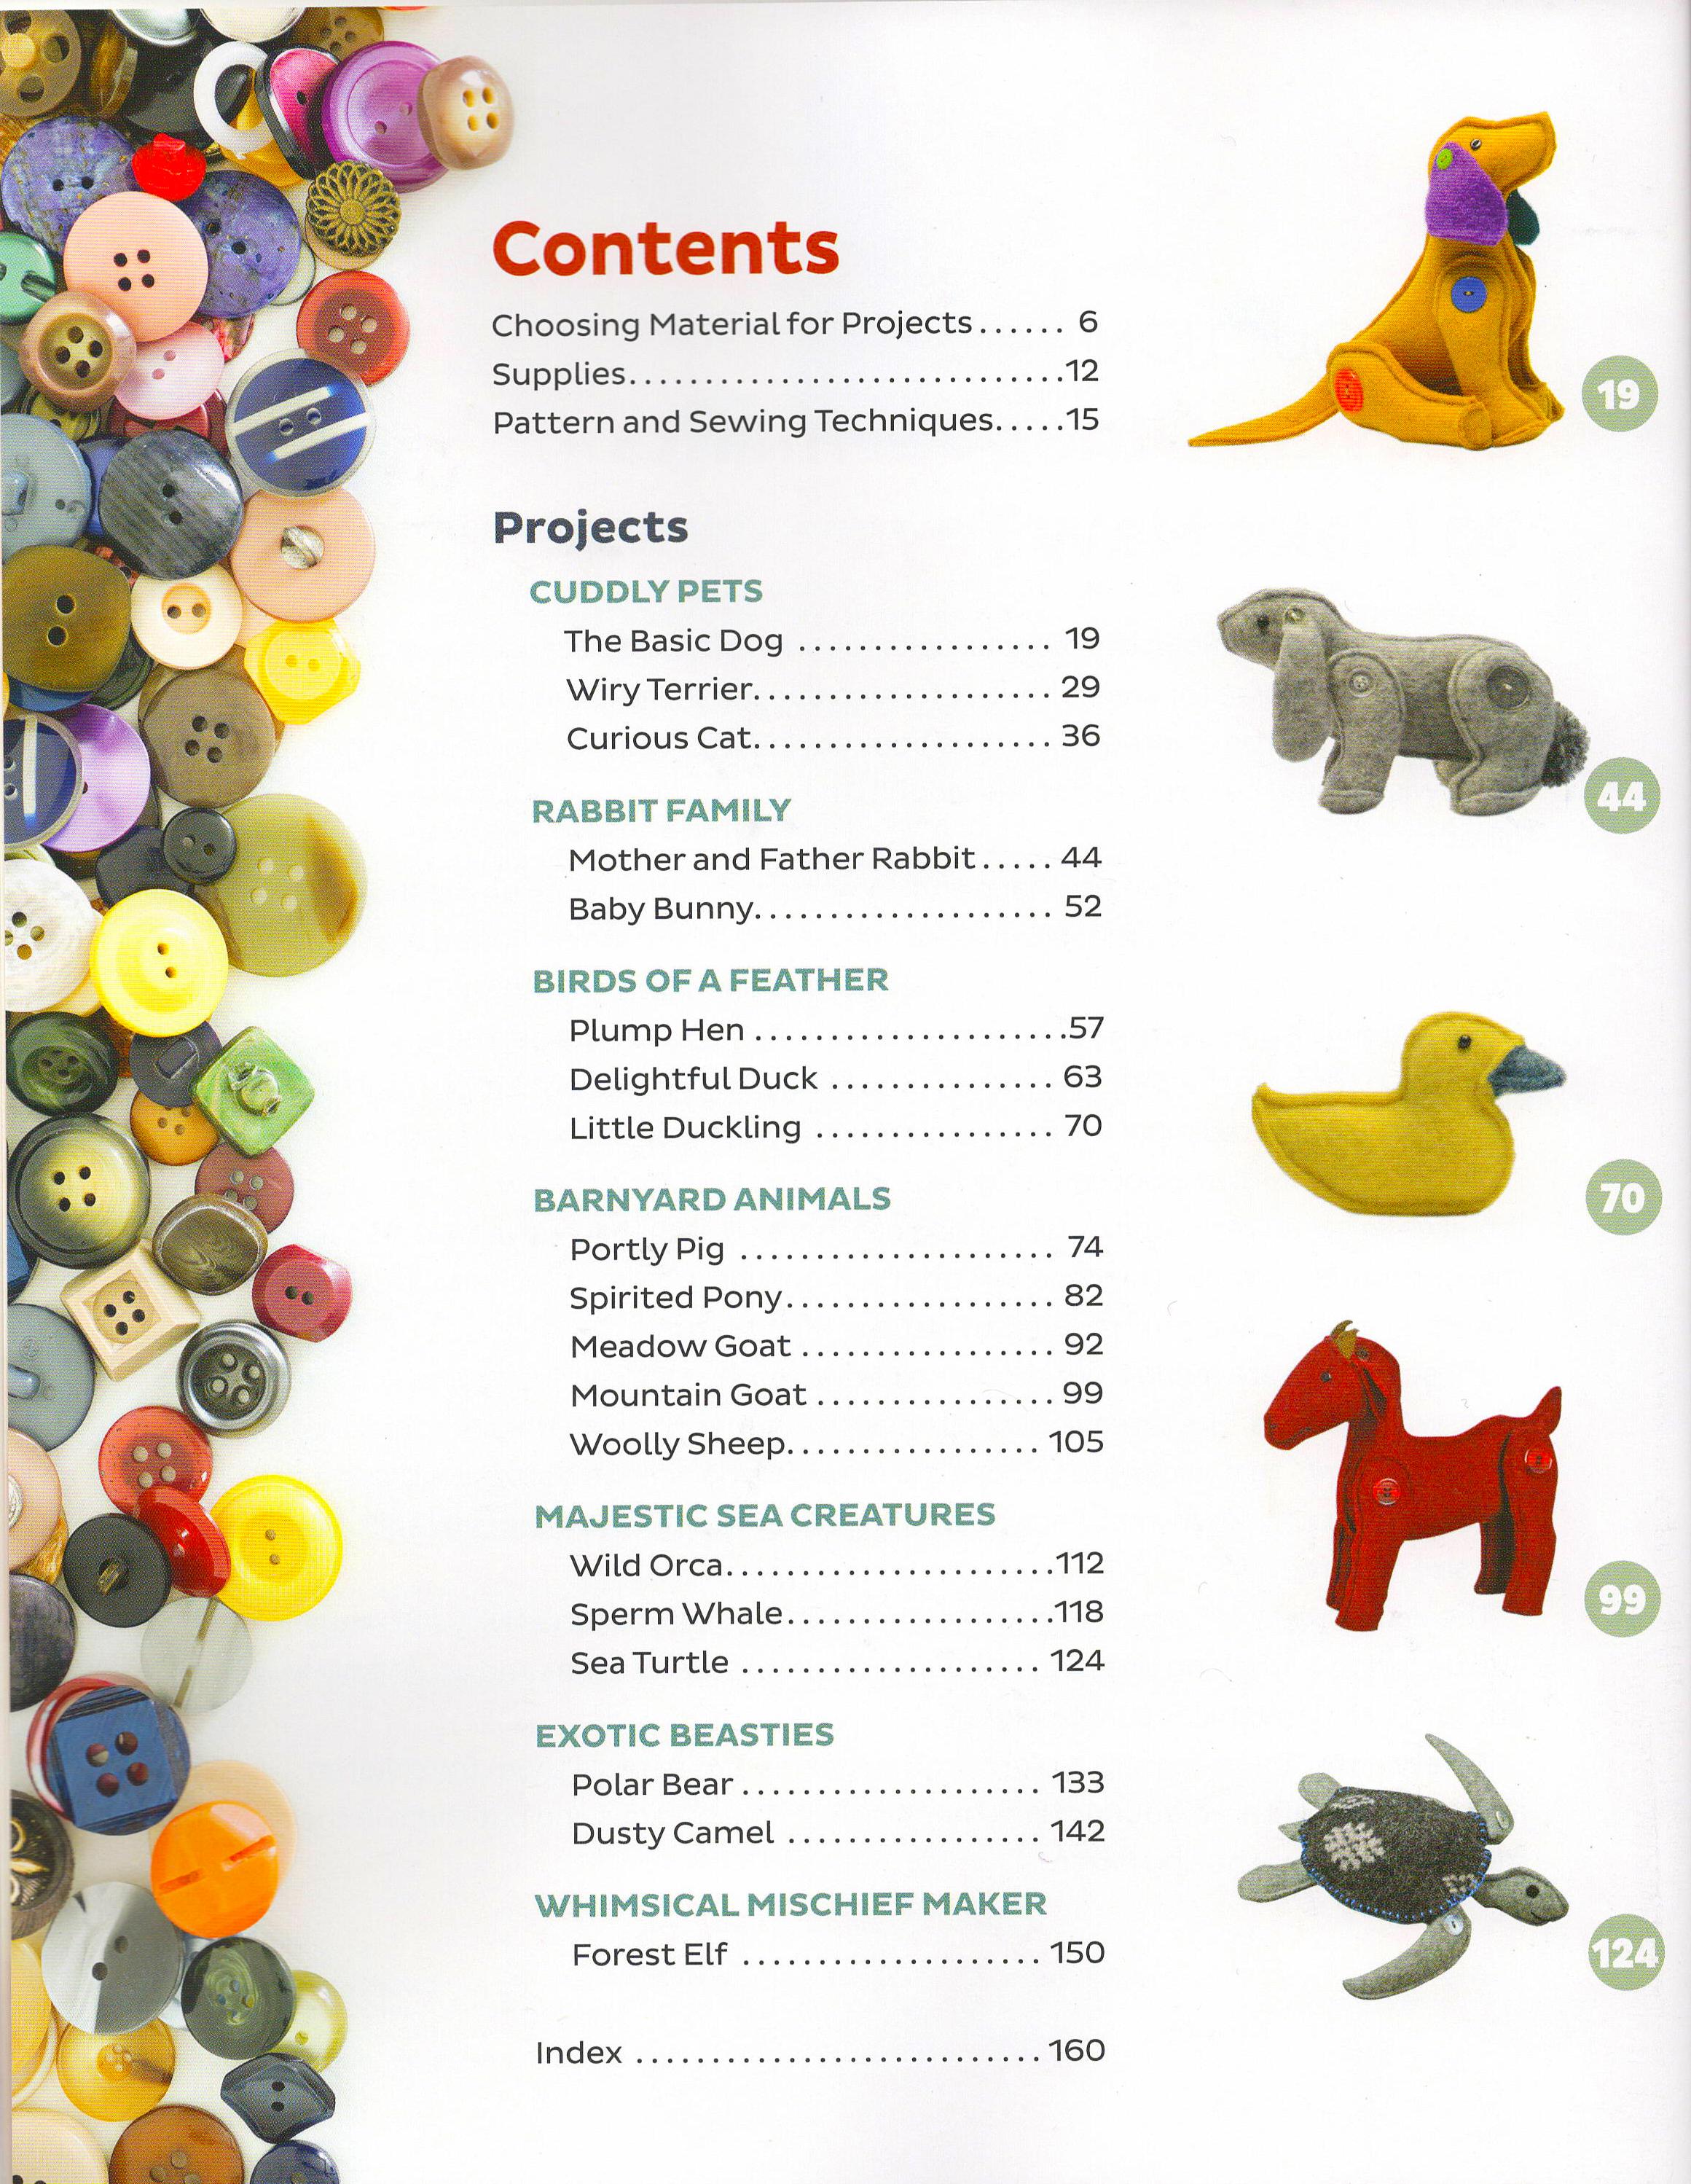 Stuffed Animals contents.jpeg